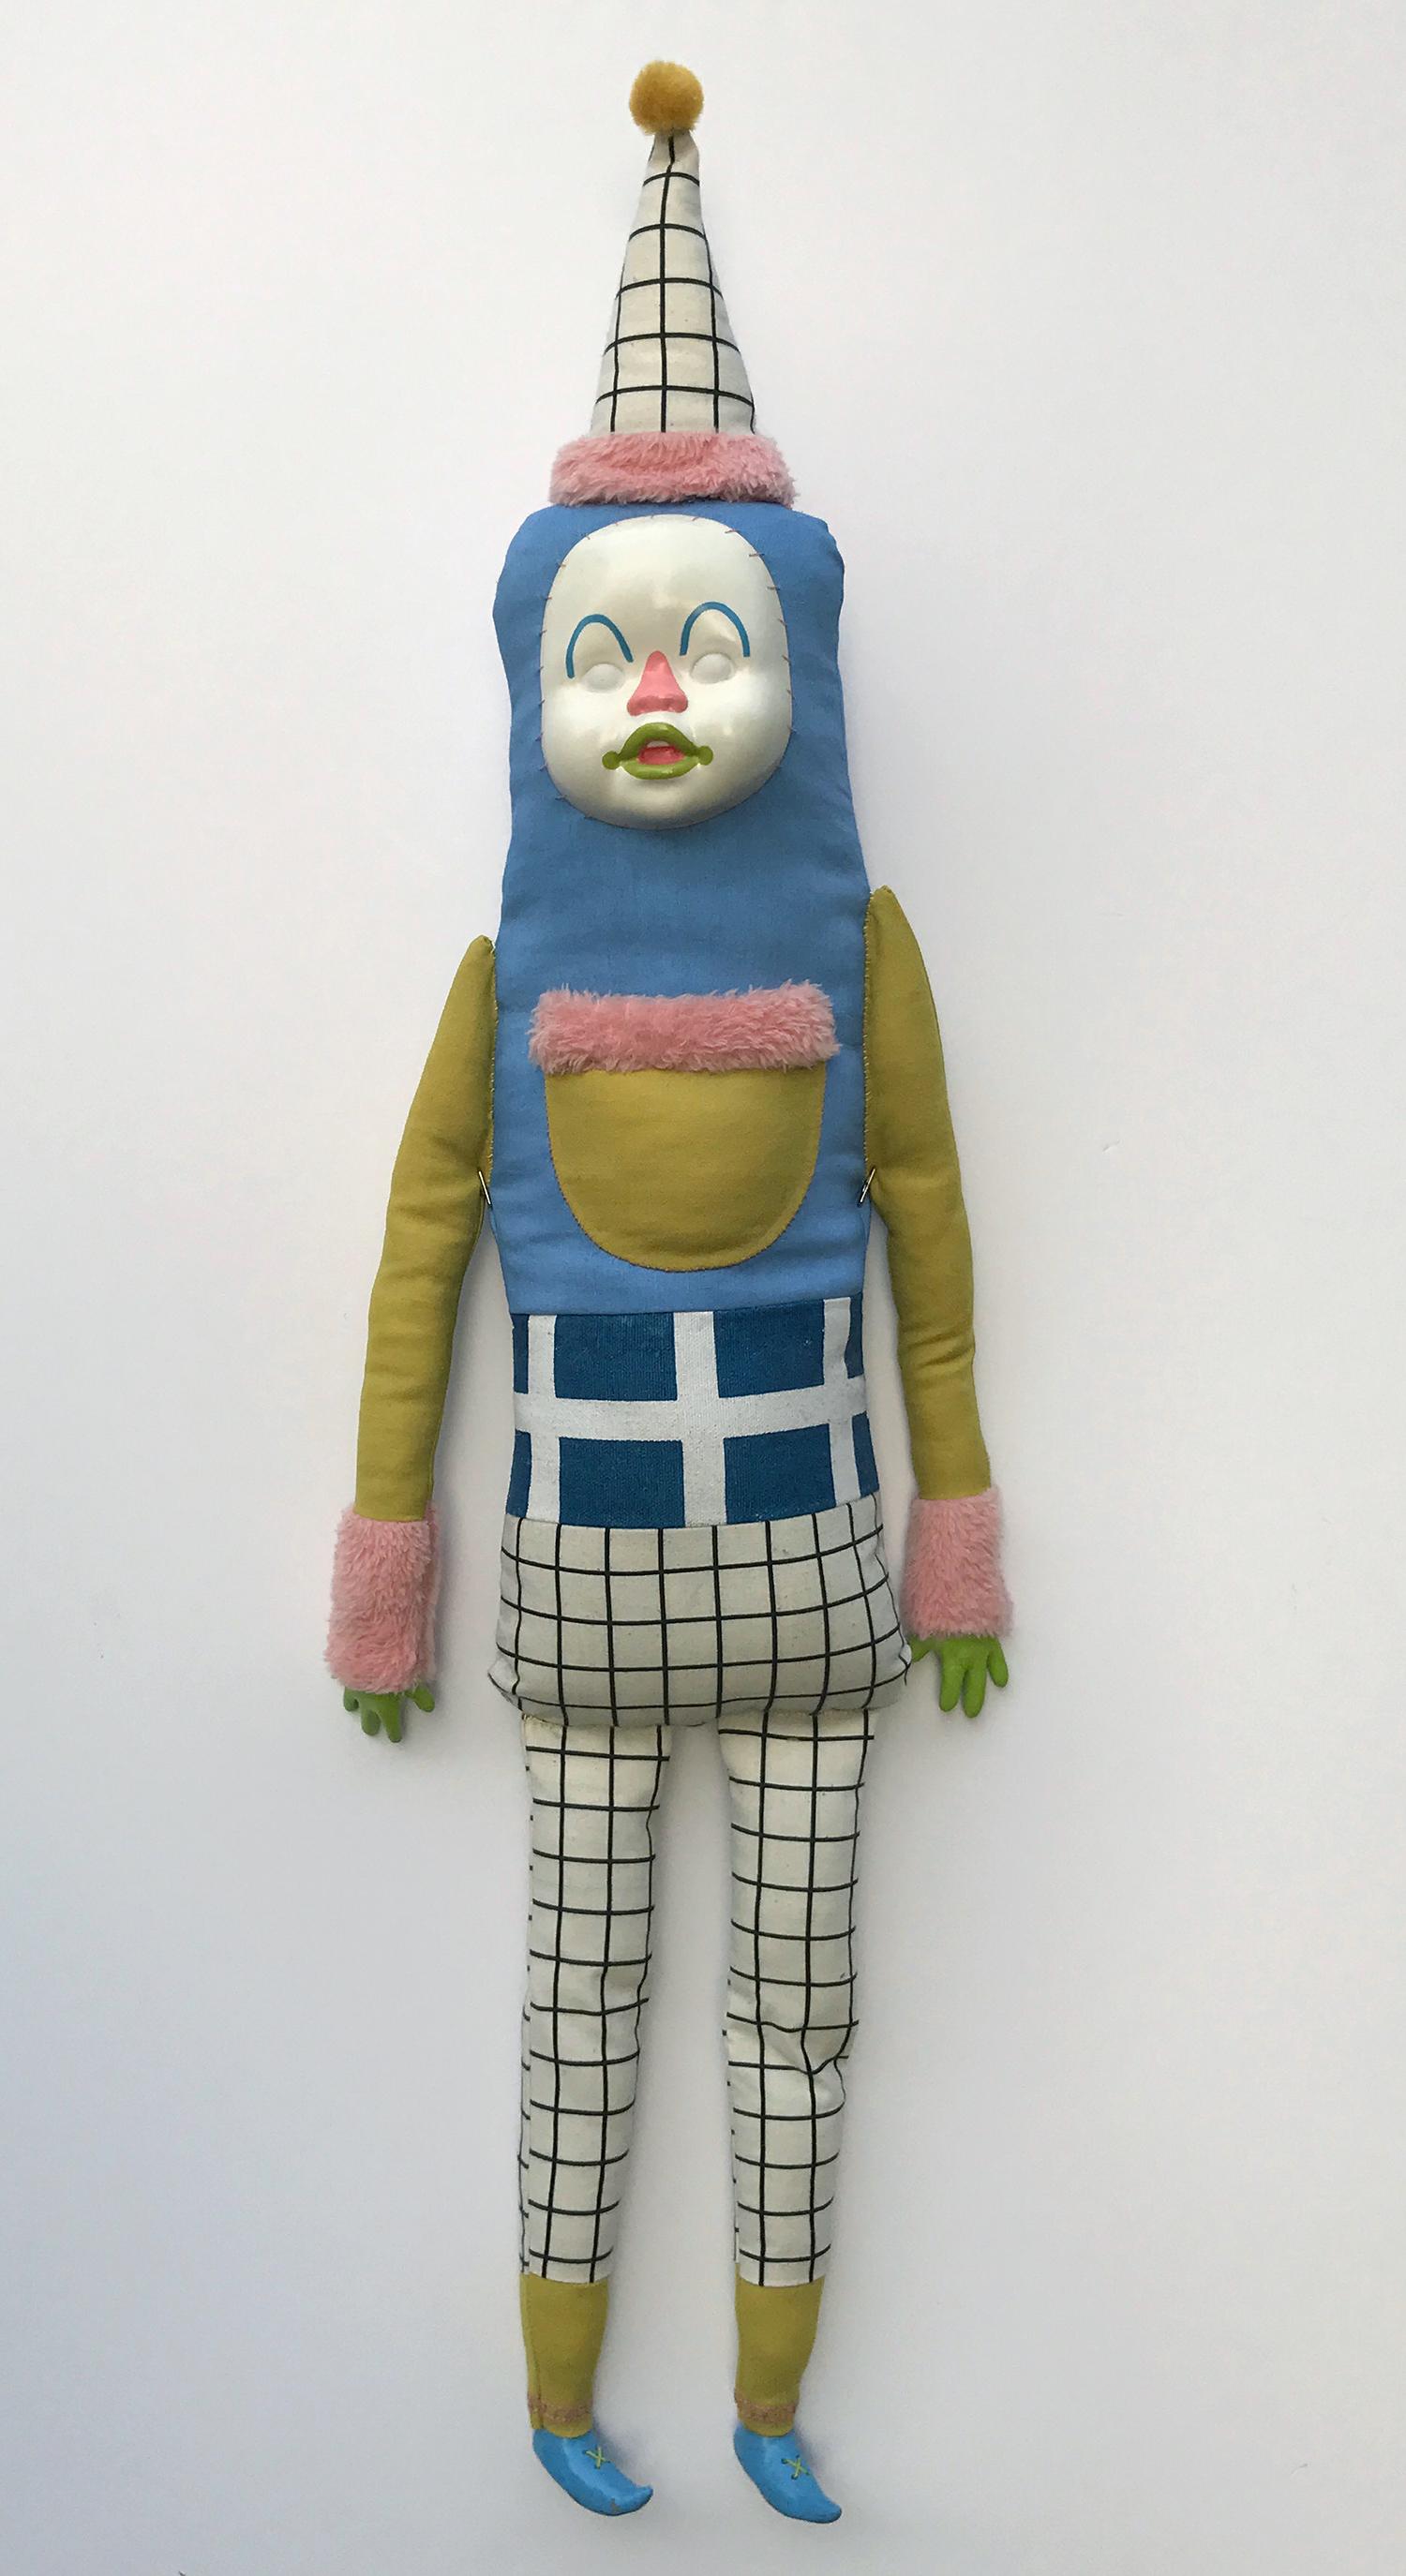 musser_kristin_clown_large.jpg